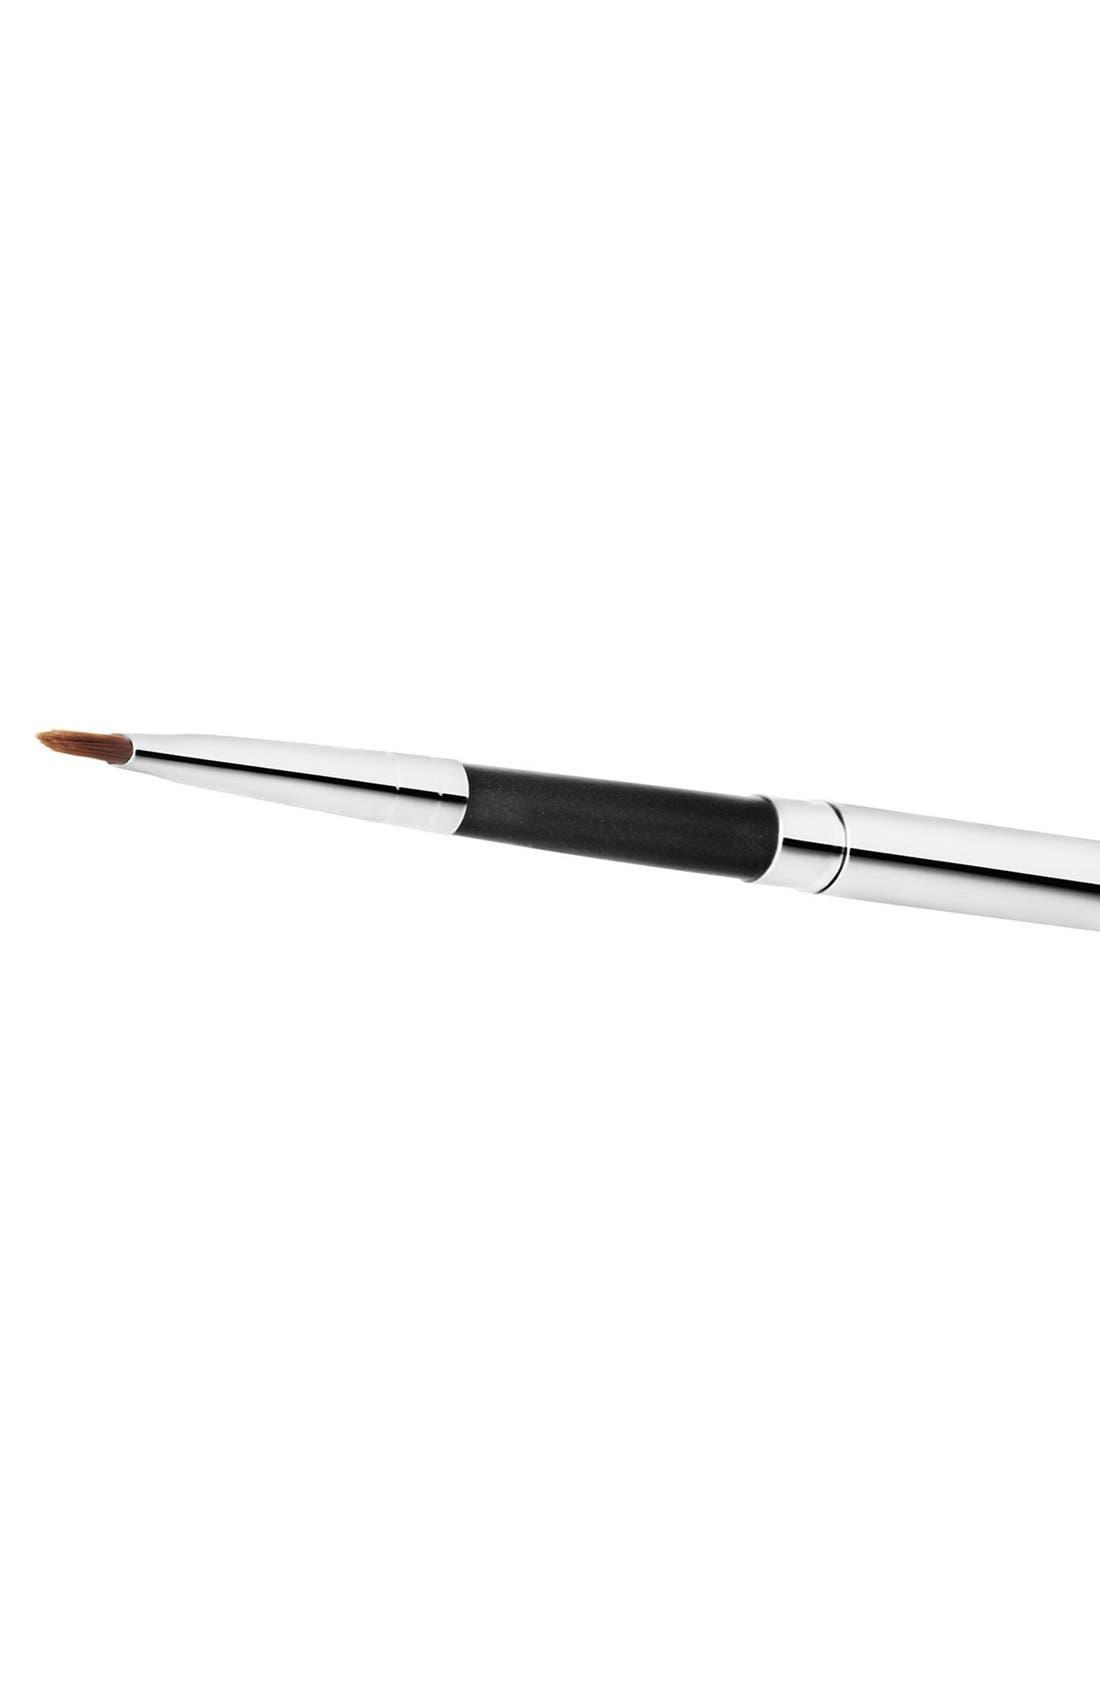 MAC 316 Lip Brush,                             Alternate thumbnail 4, color,                             000